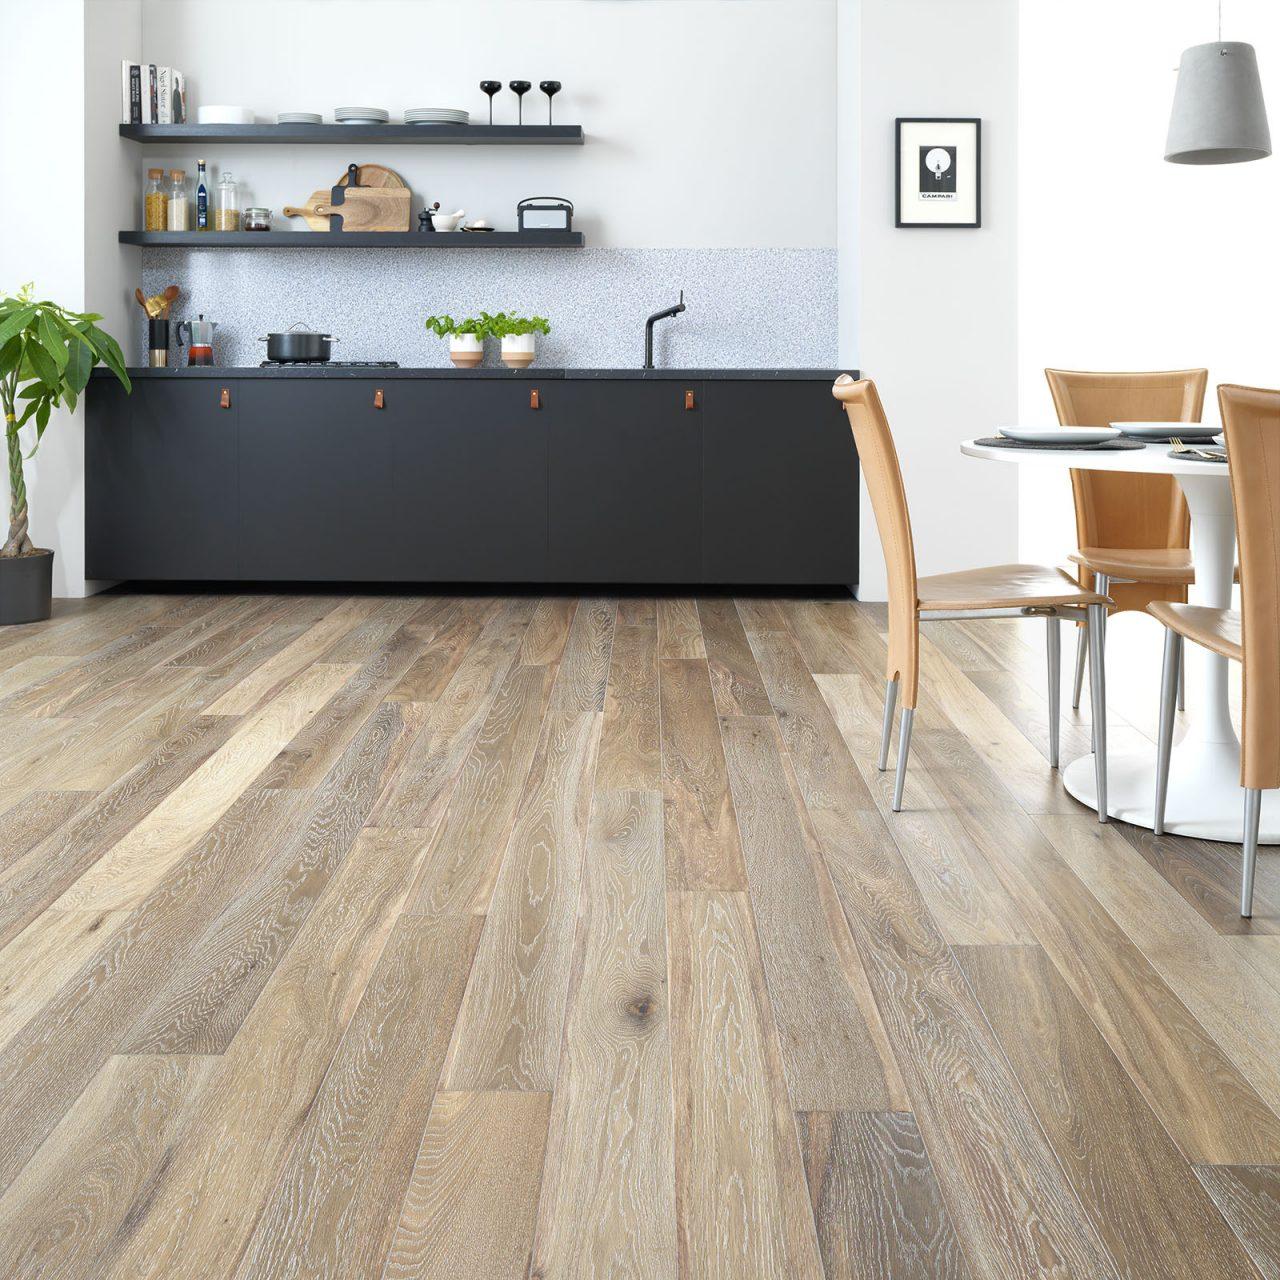 Beautiful kitchen with engineered hardwood flooring